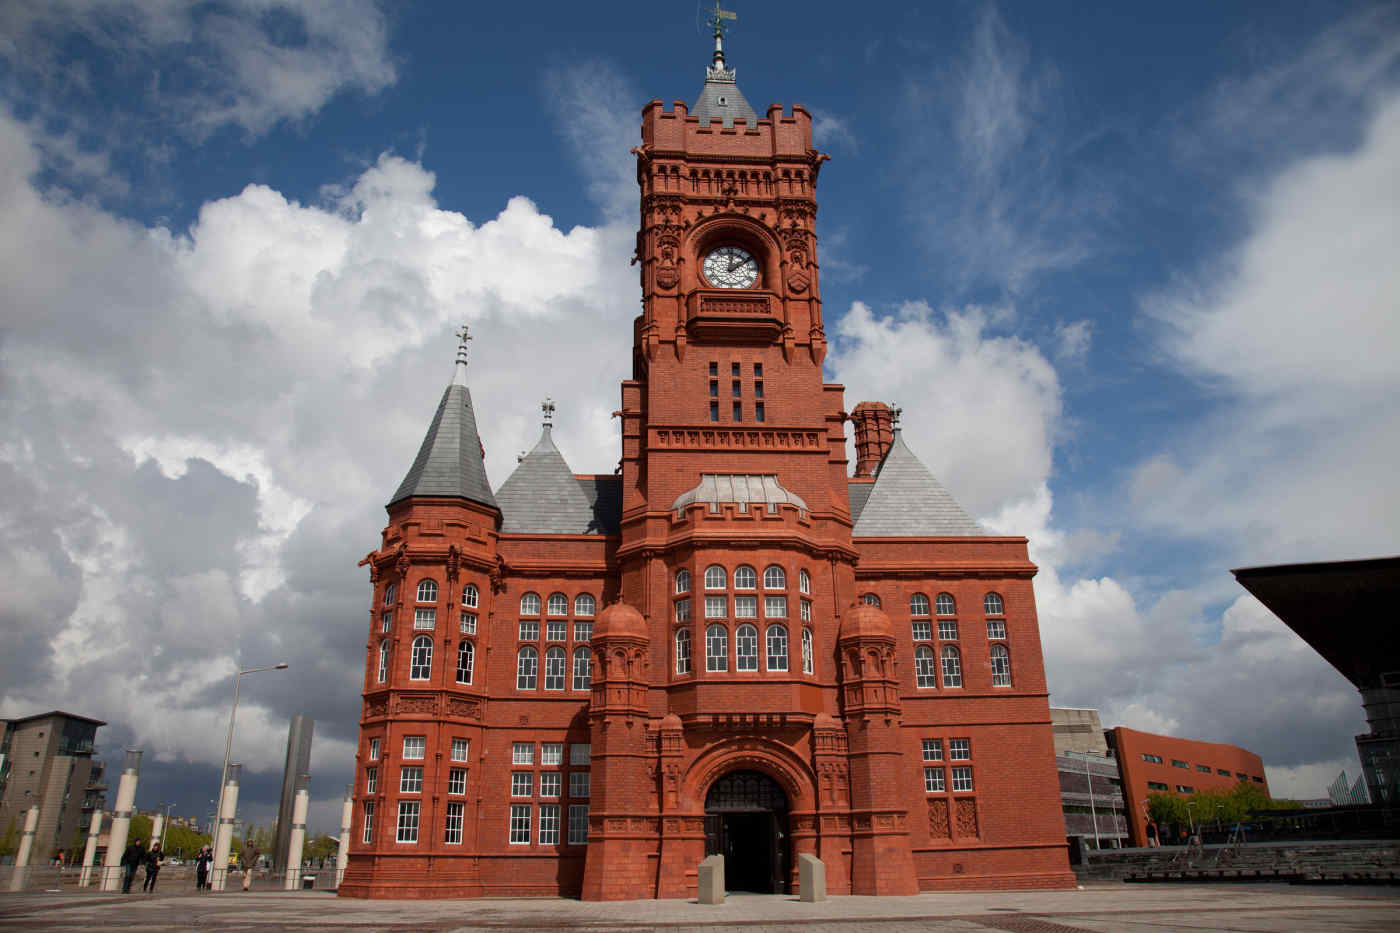 Pierhead Building, Cardiff, Wales